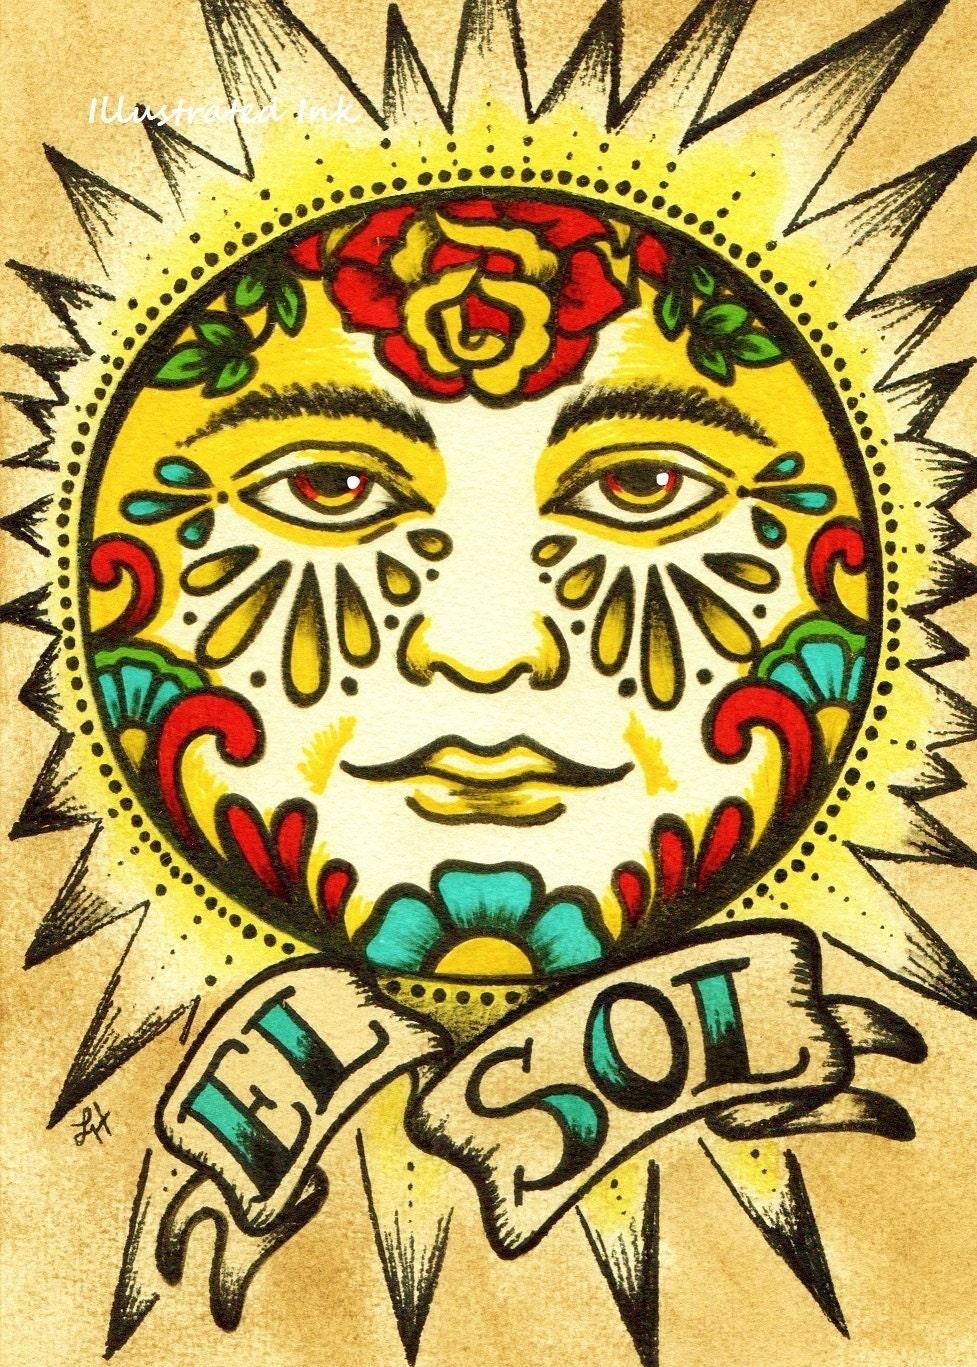 Mexican Folk Art Sun EL SOL Loteria Print 5 x 7 8 x 10 or 11 | Etsy